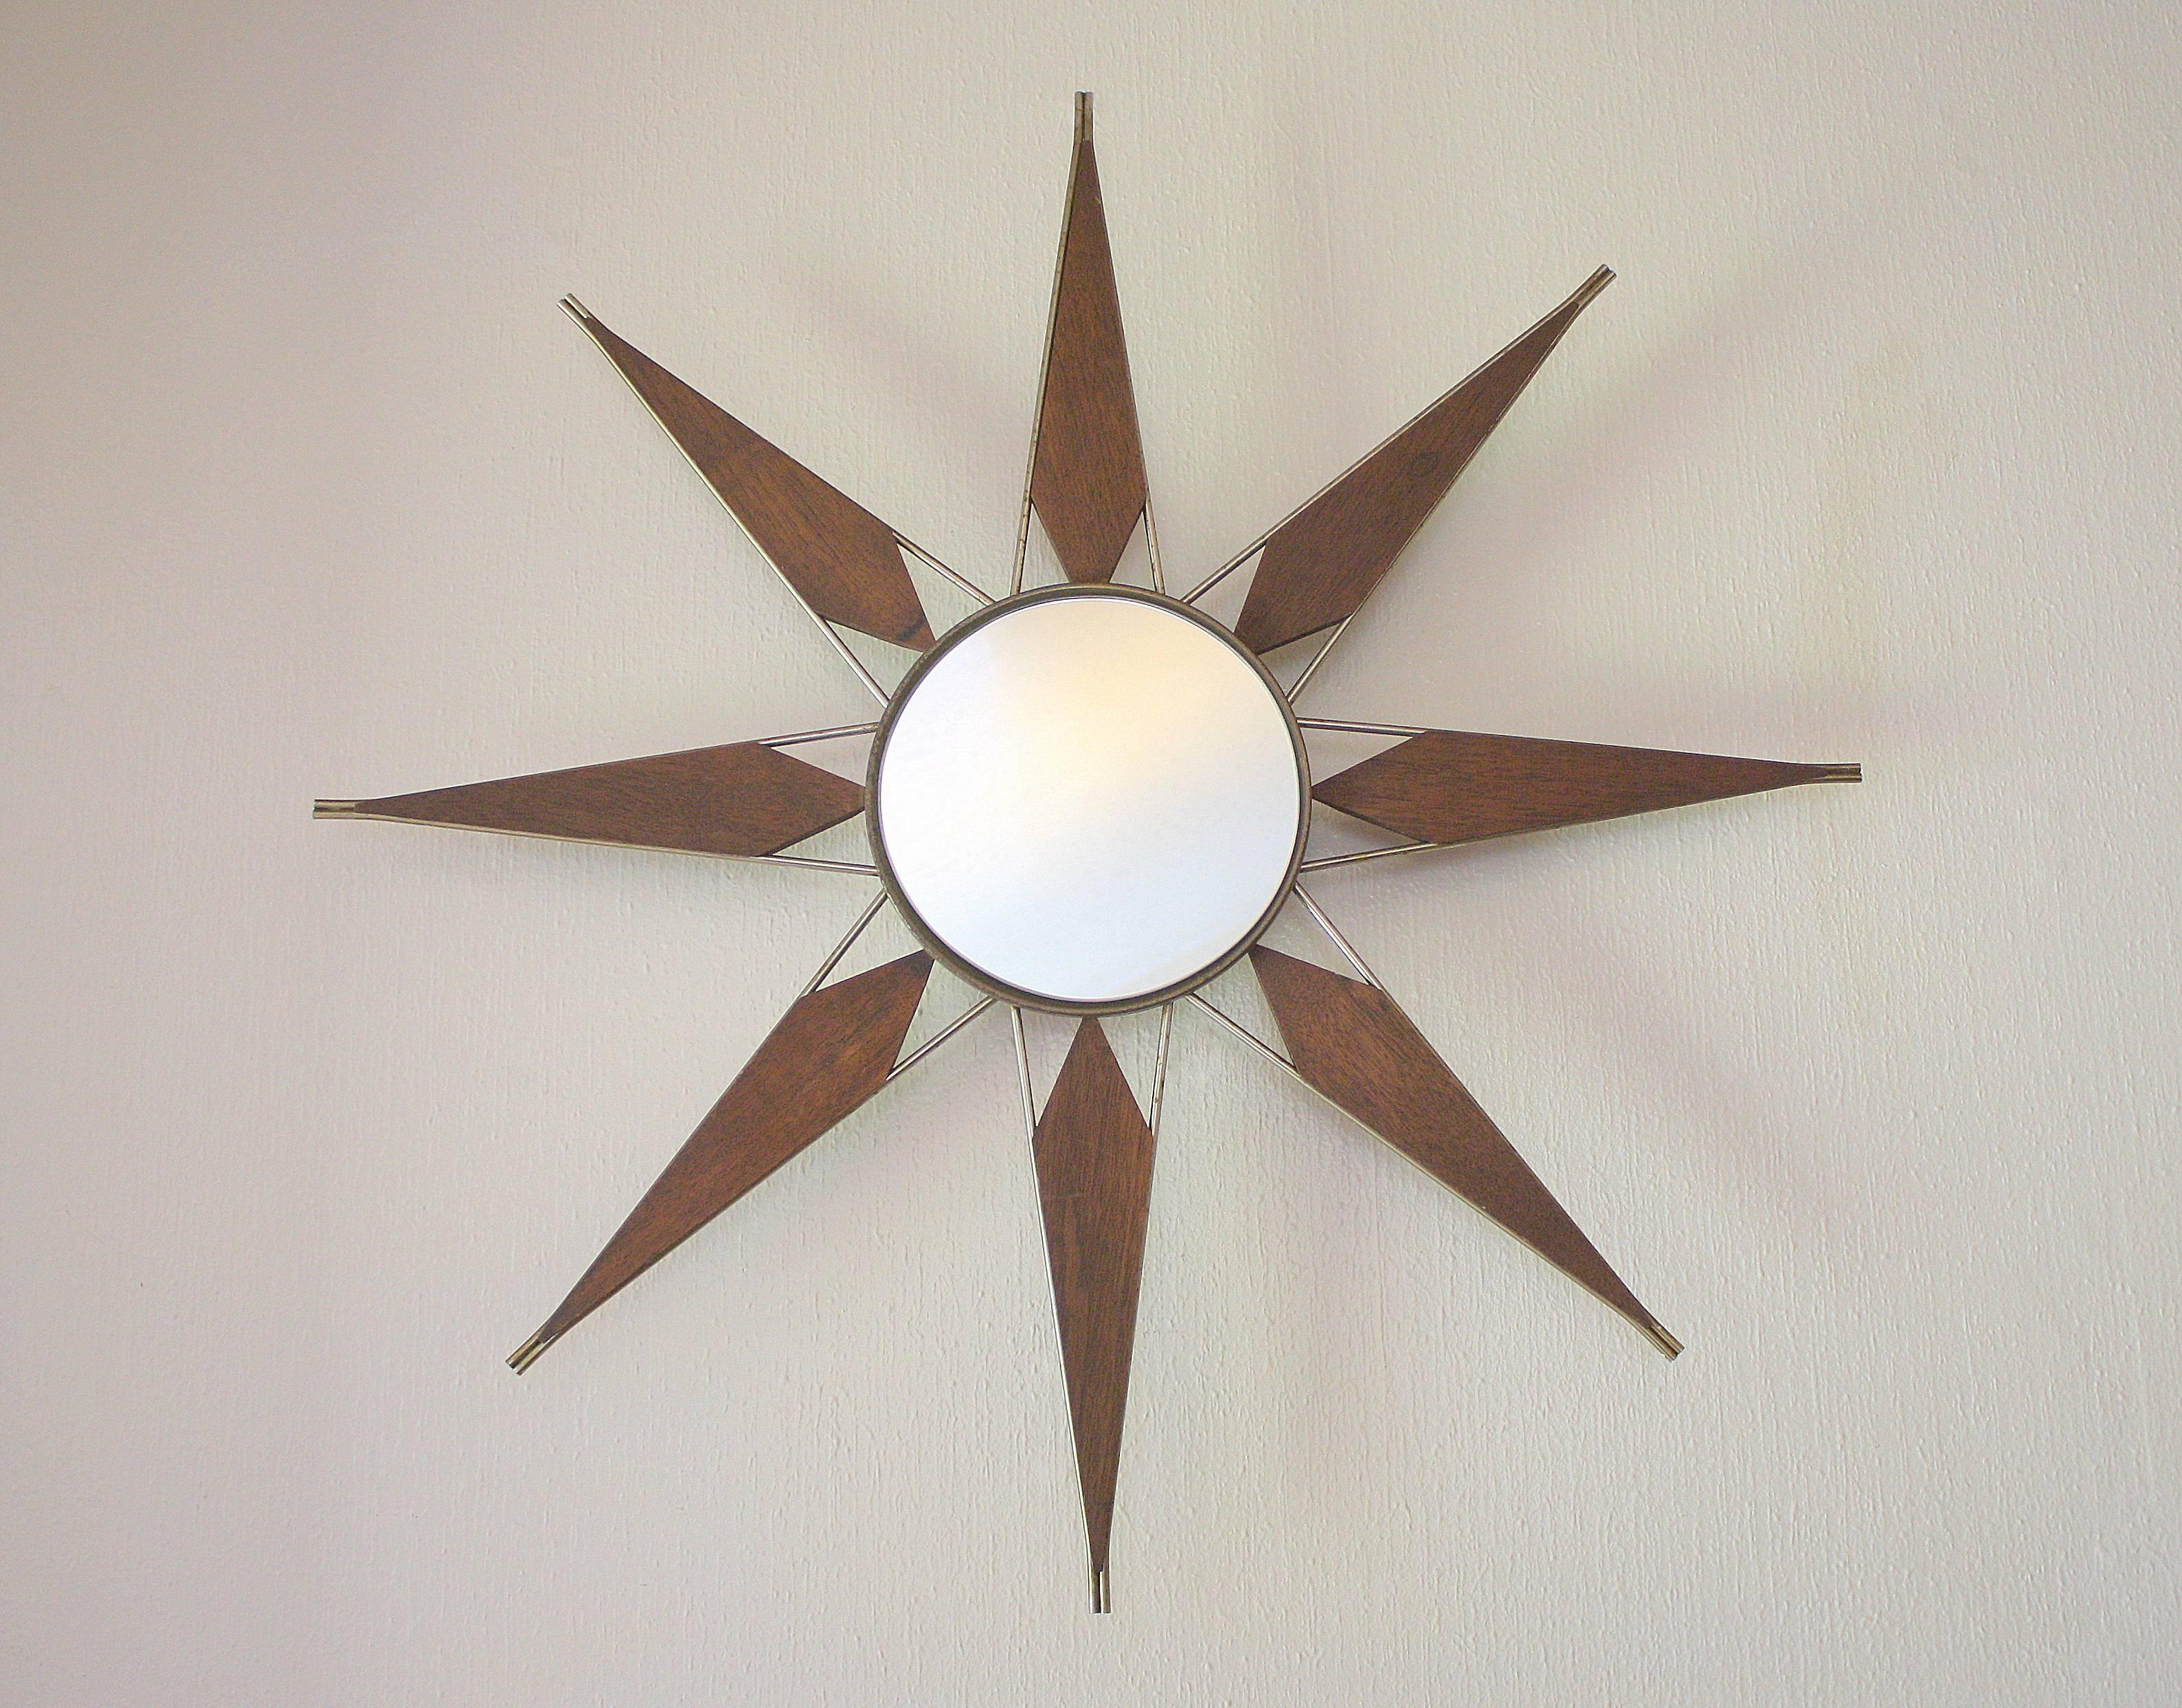 Make A Vintage Starburst Mirror — Interior Home Design Intended For Bronze Starburst Mirrors (View 16 of 25)